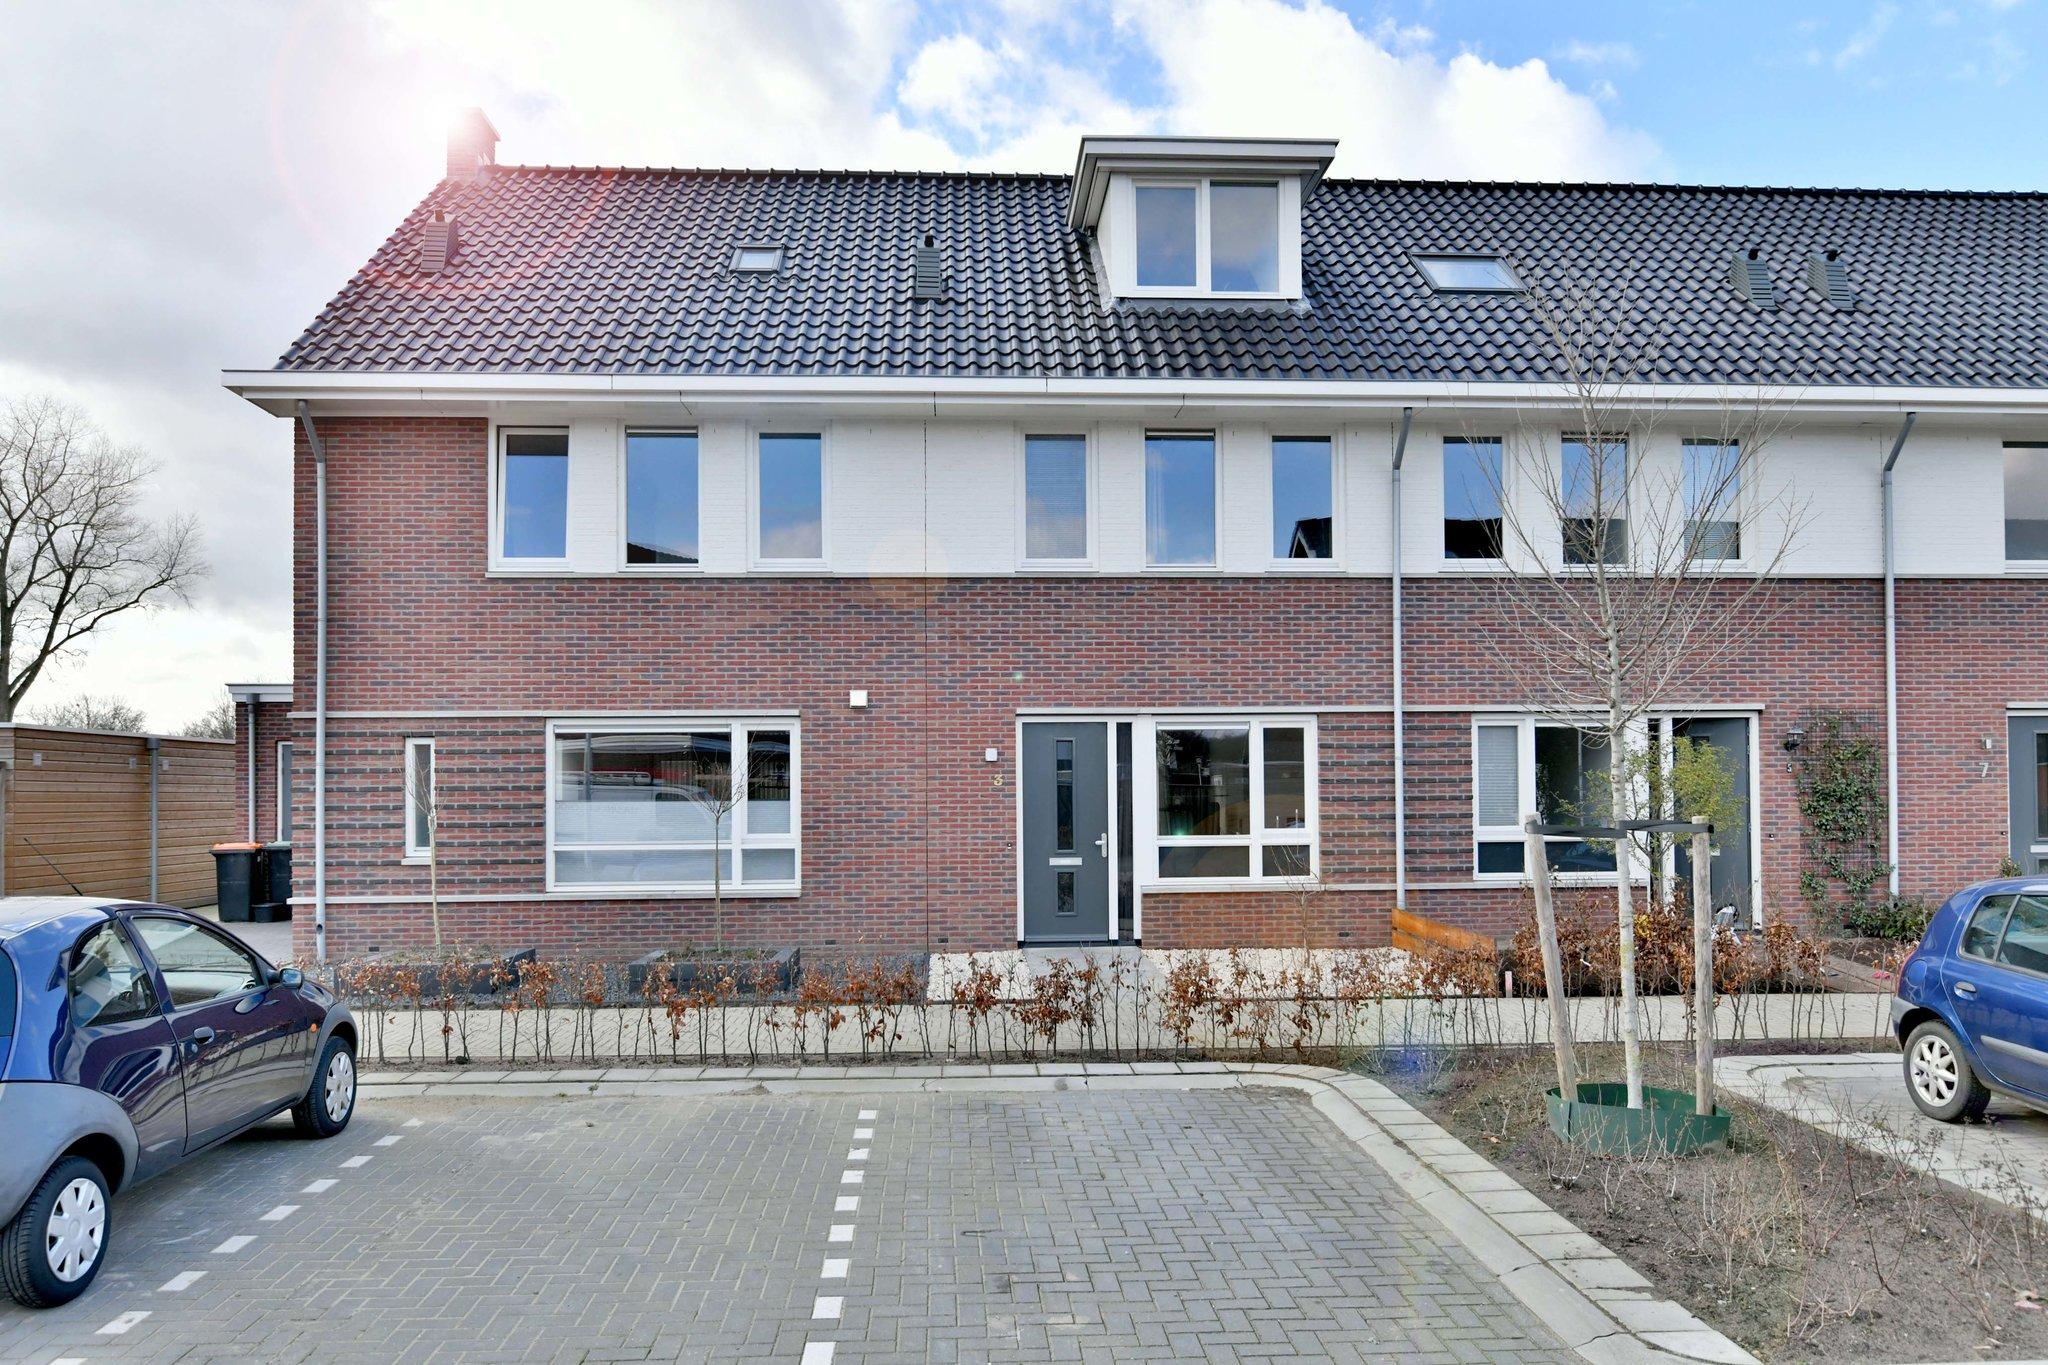 epse-marienhorst-4412137-foto-24.jpg